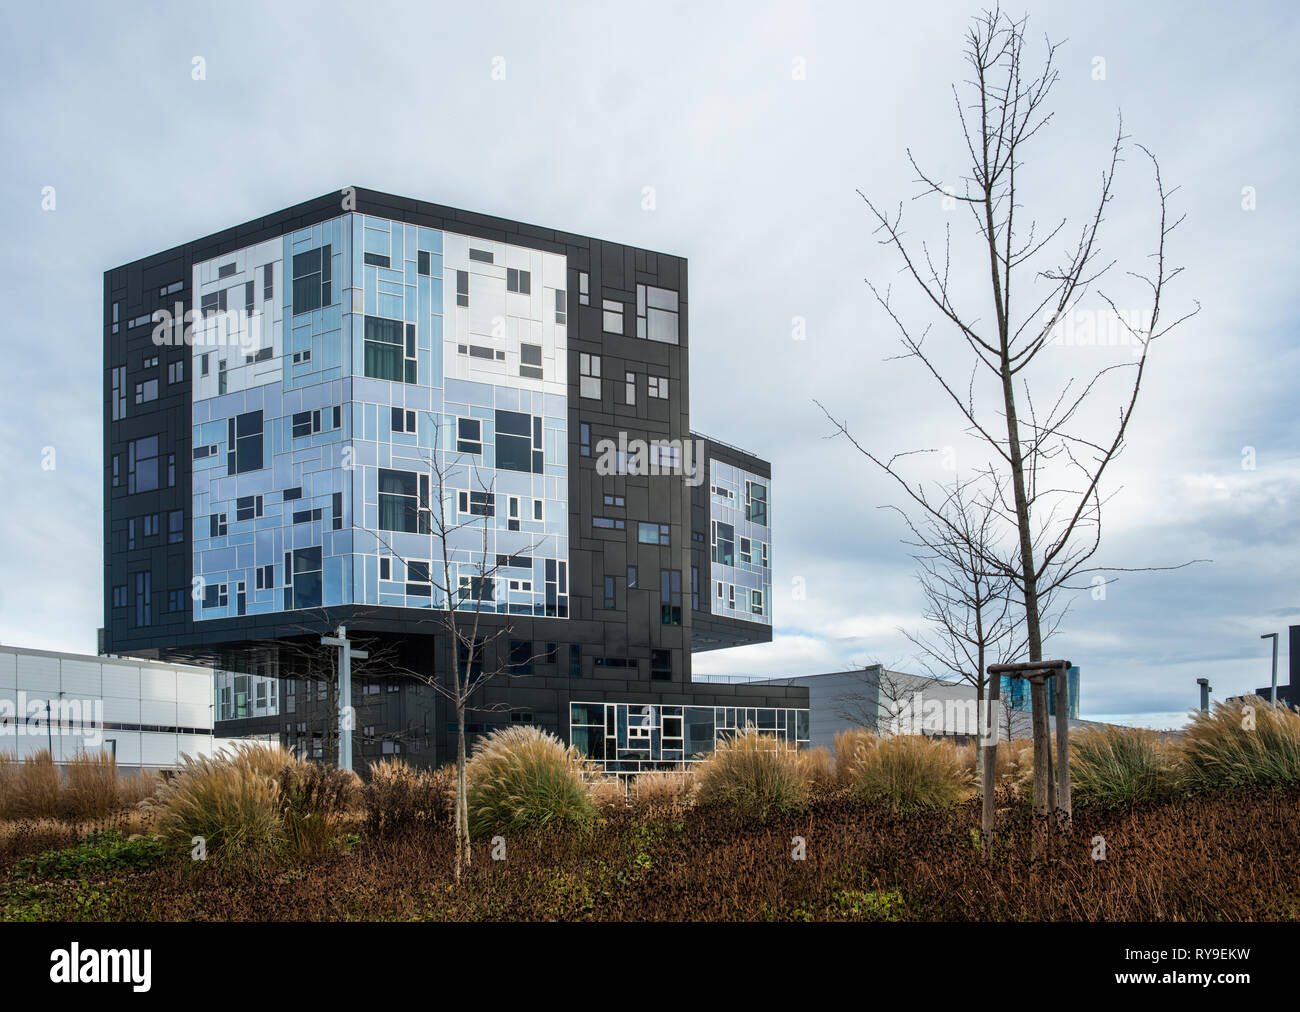 University of Economics and Business - Executive Academy building in Leopoldstadt Vienna Austria Europe - Stock Image